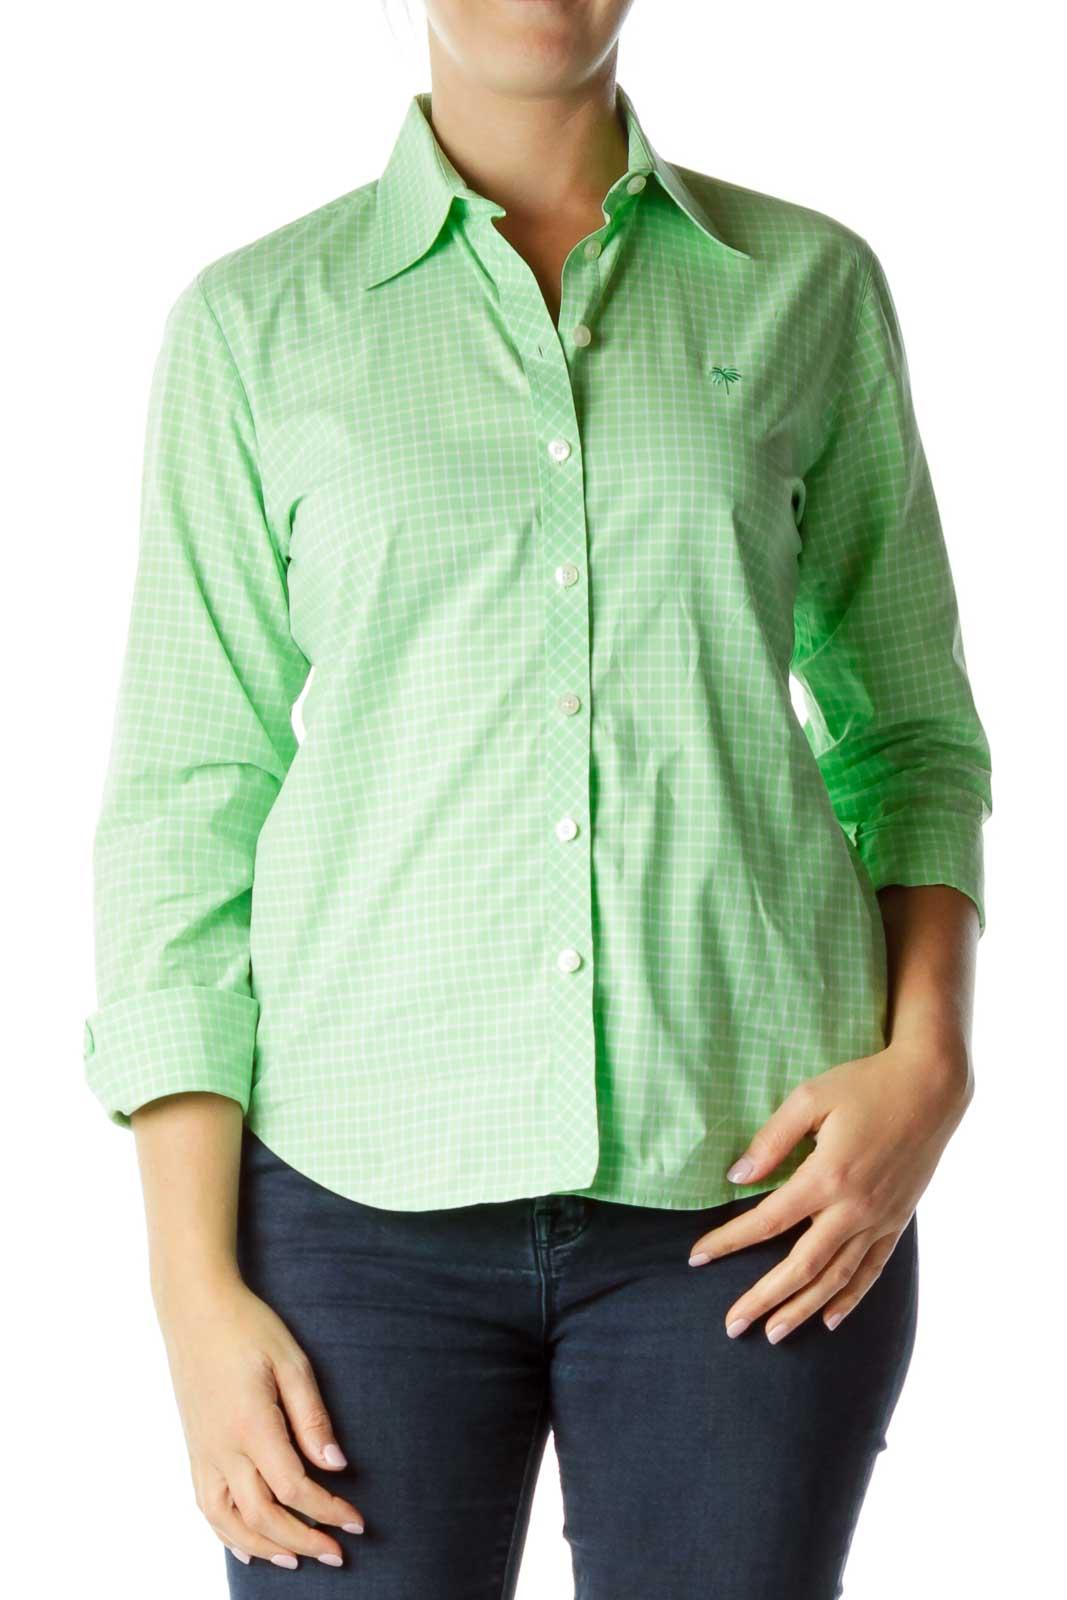 Green White Plaid Shirt Front